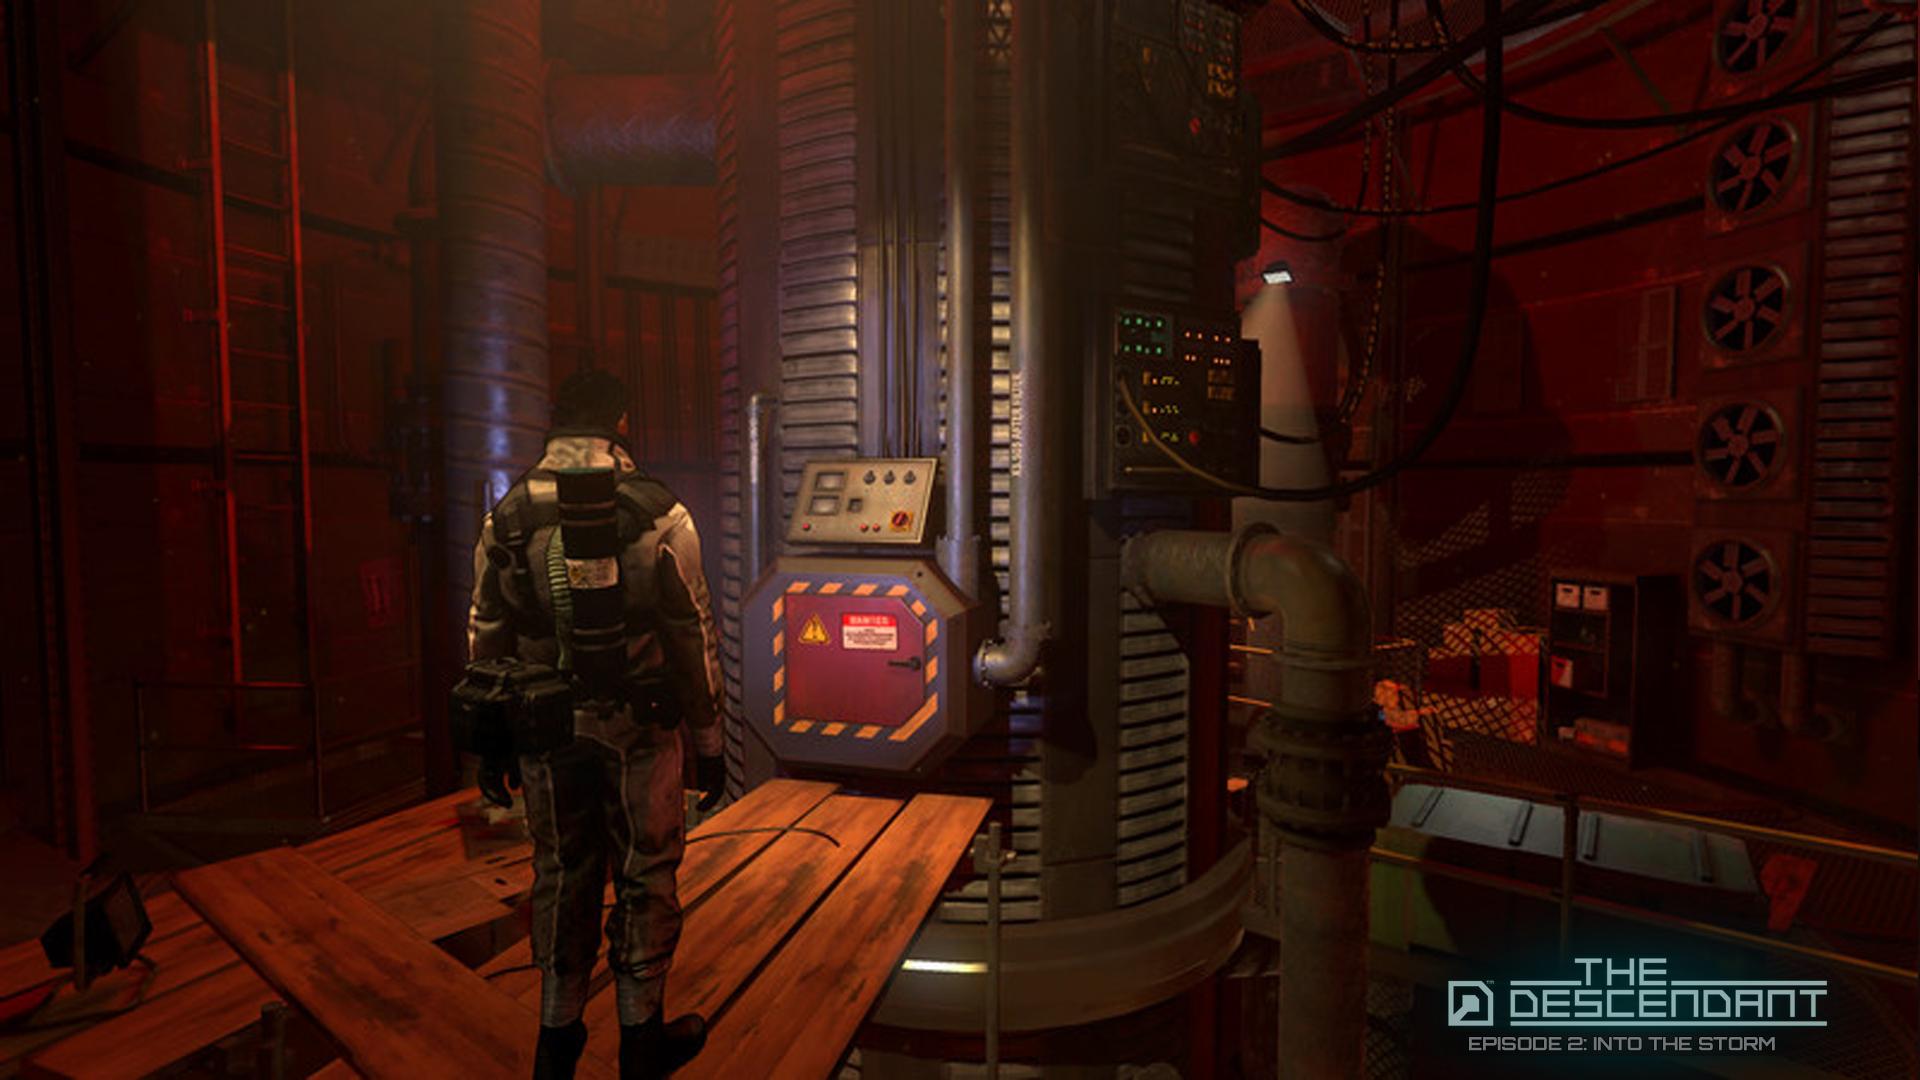 The Descendant screenshot